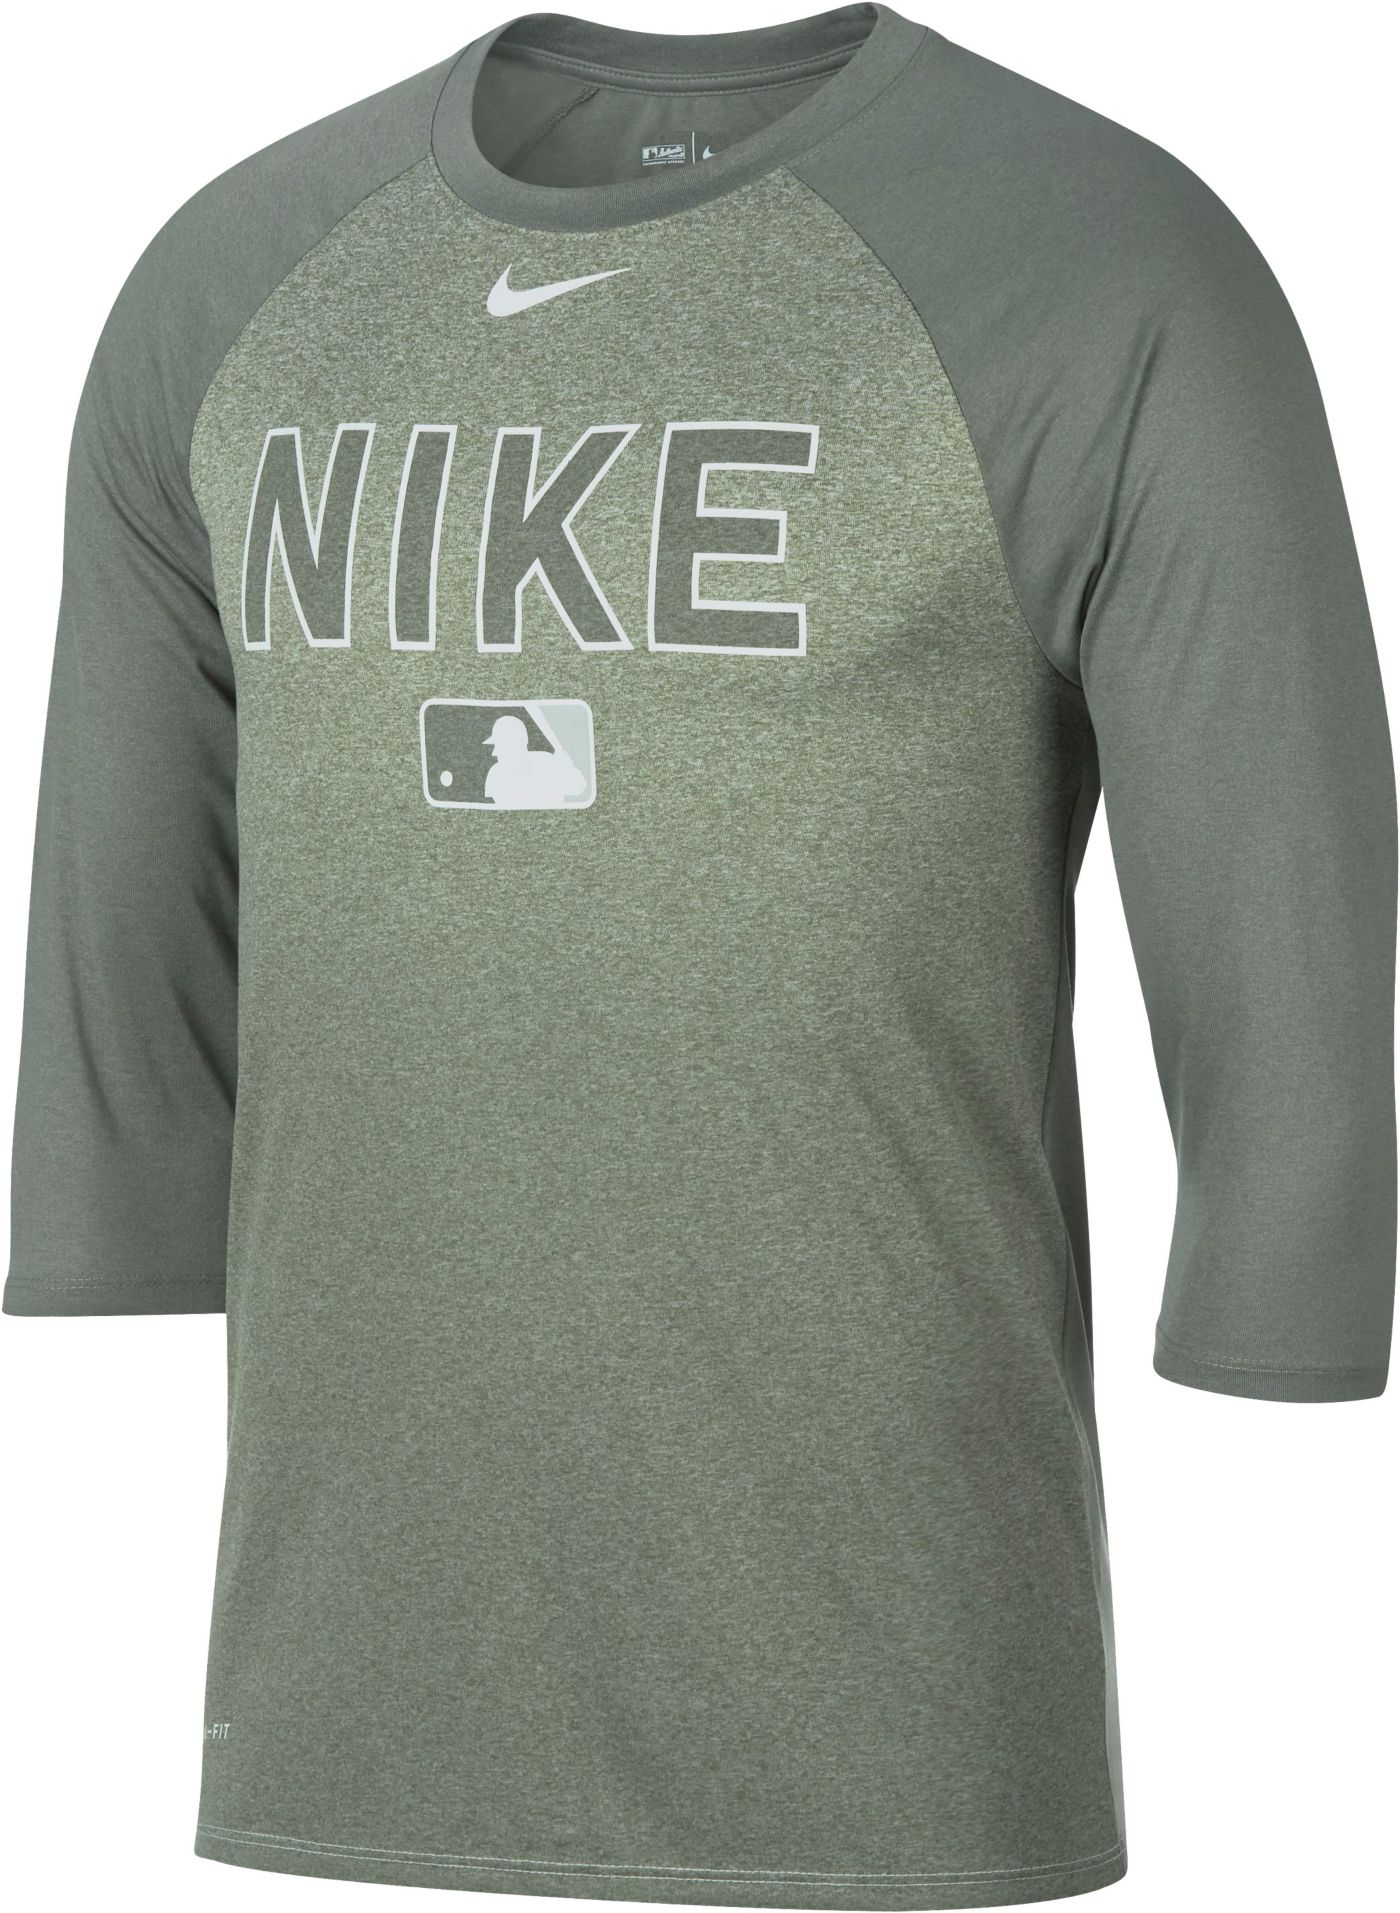 Nike Men's Legend Raglan ¾-Sleeve Baseball Shirt